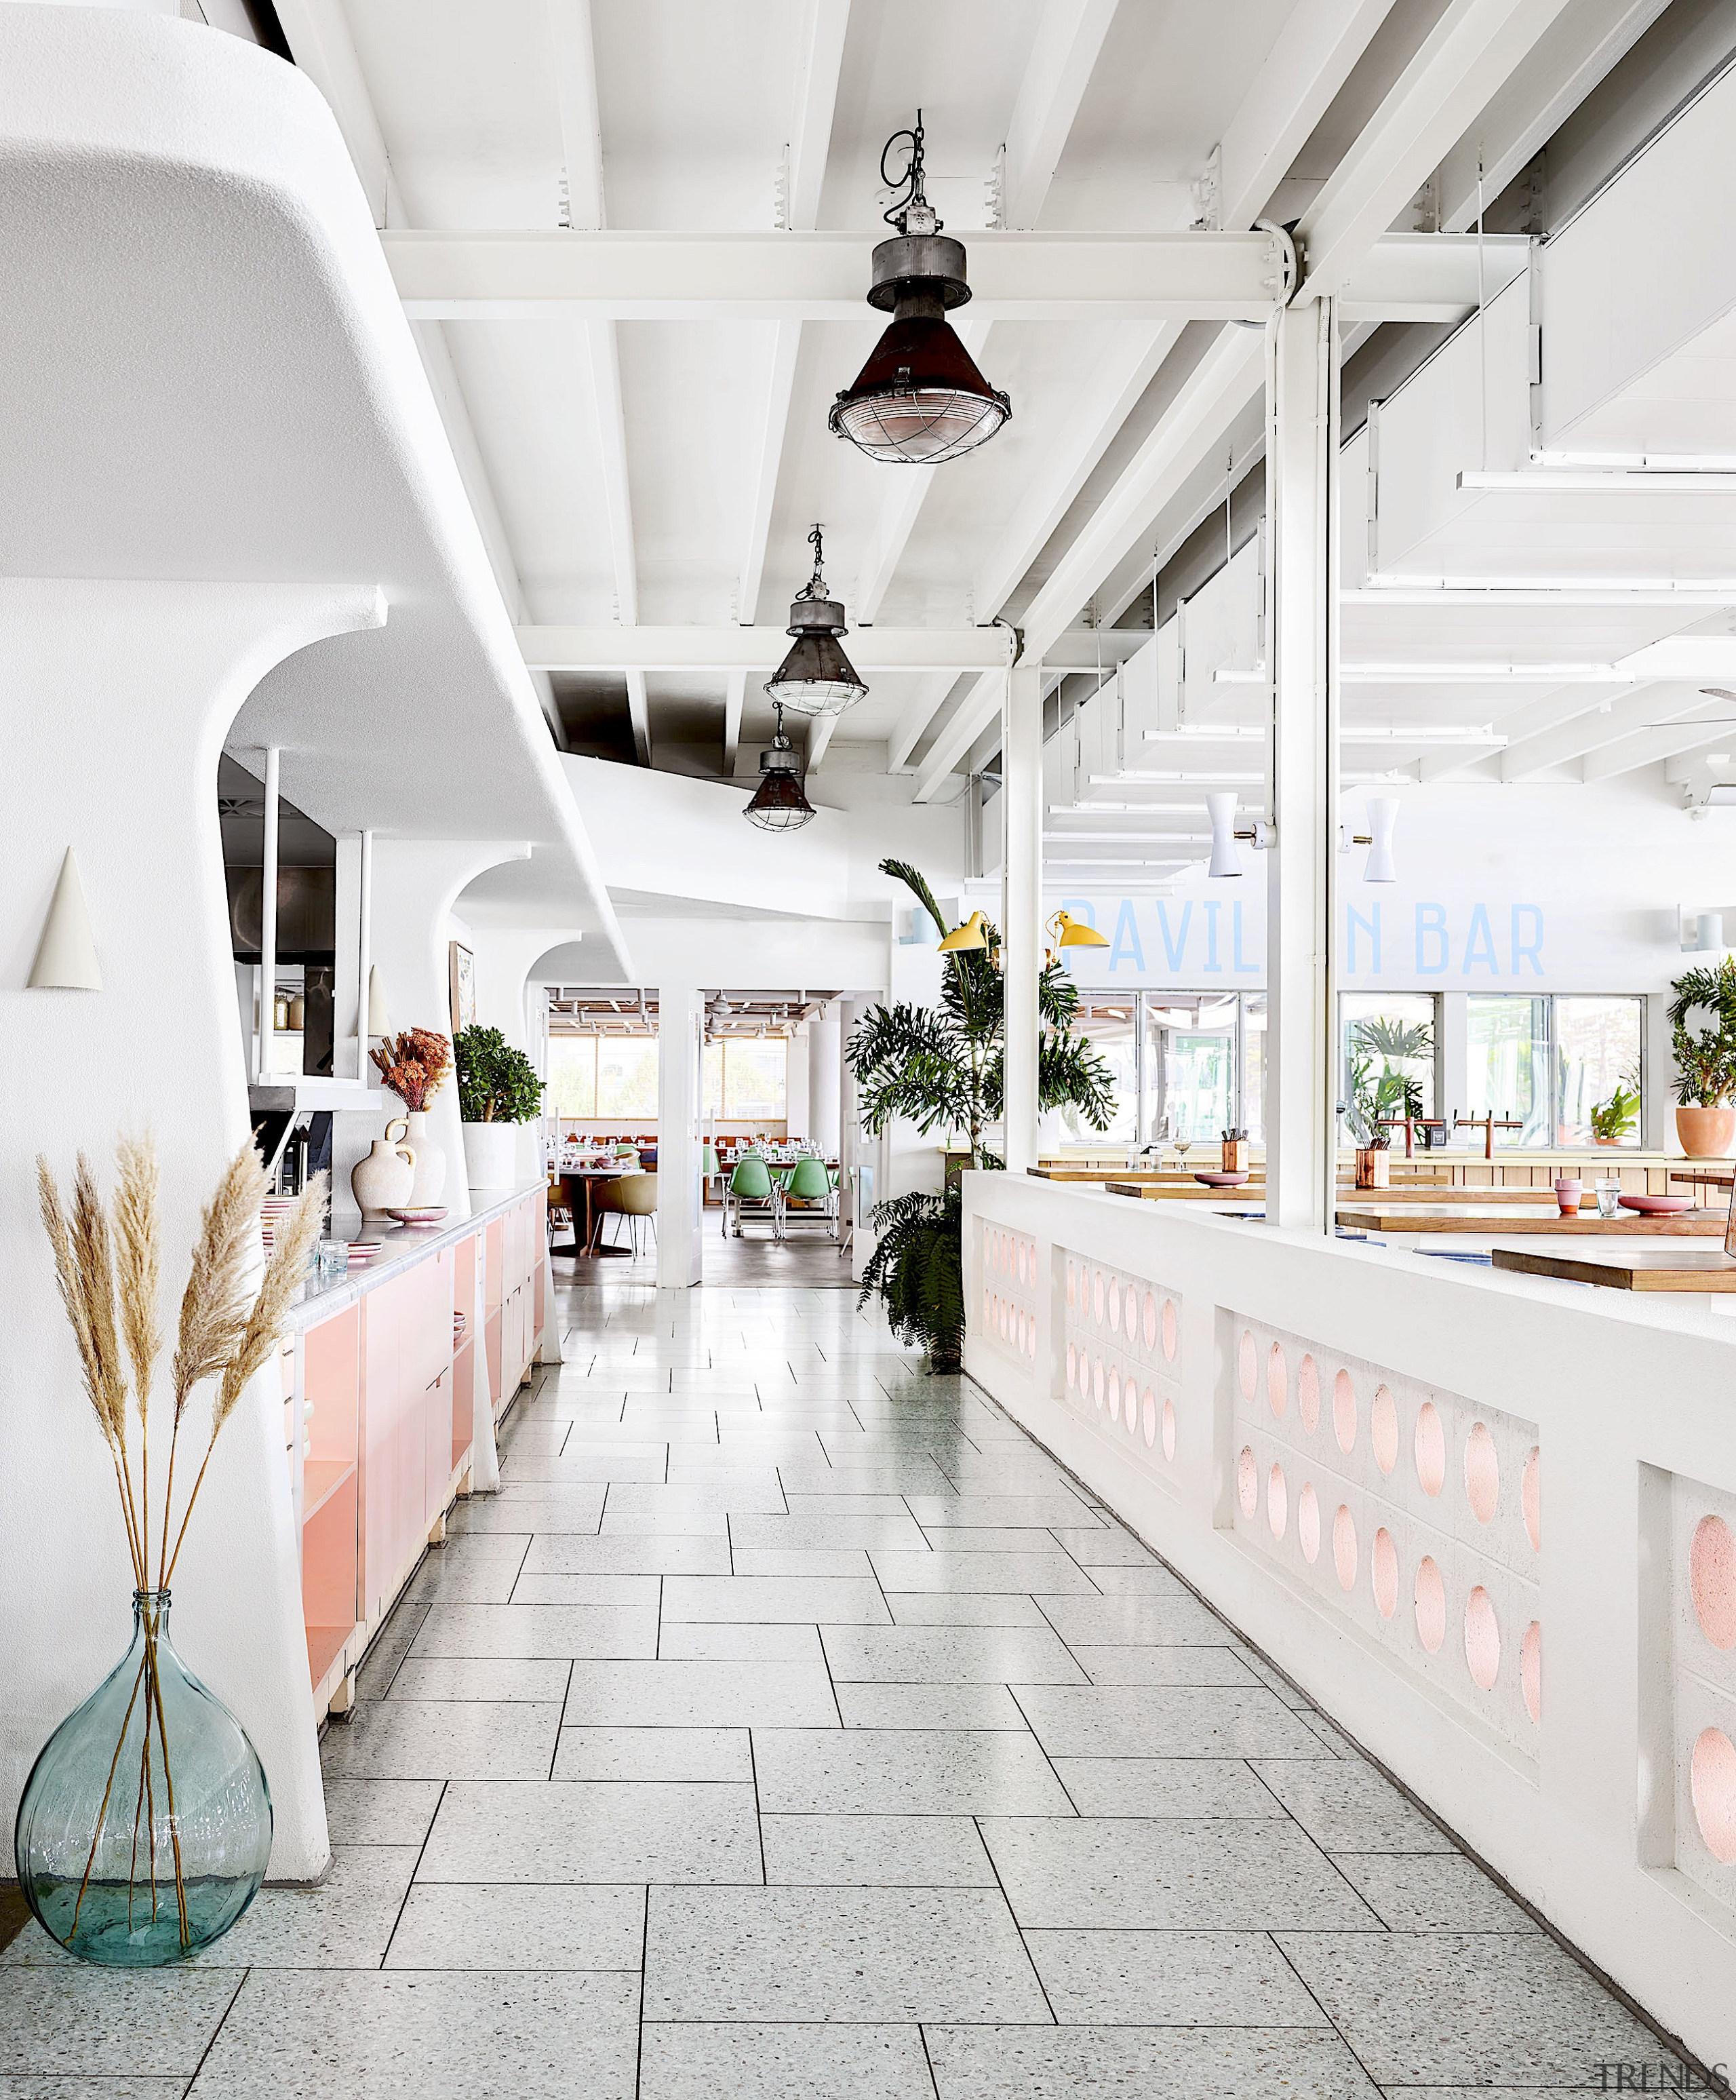 The Tropic – an a la carte restaurant